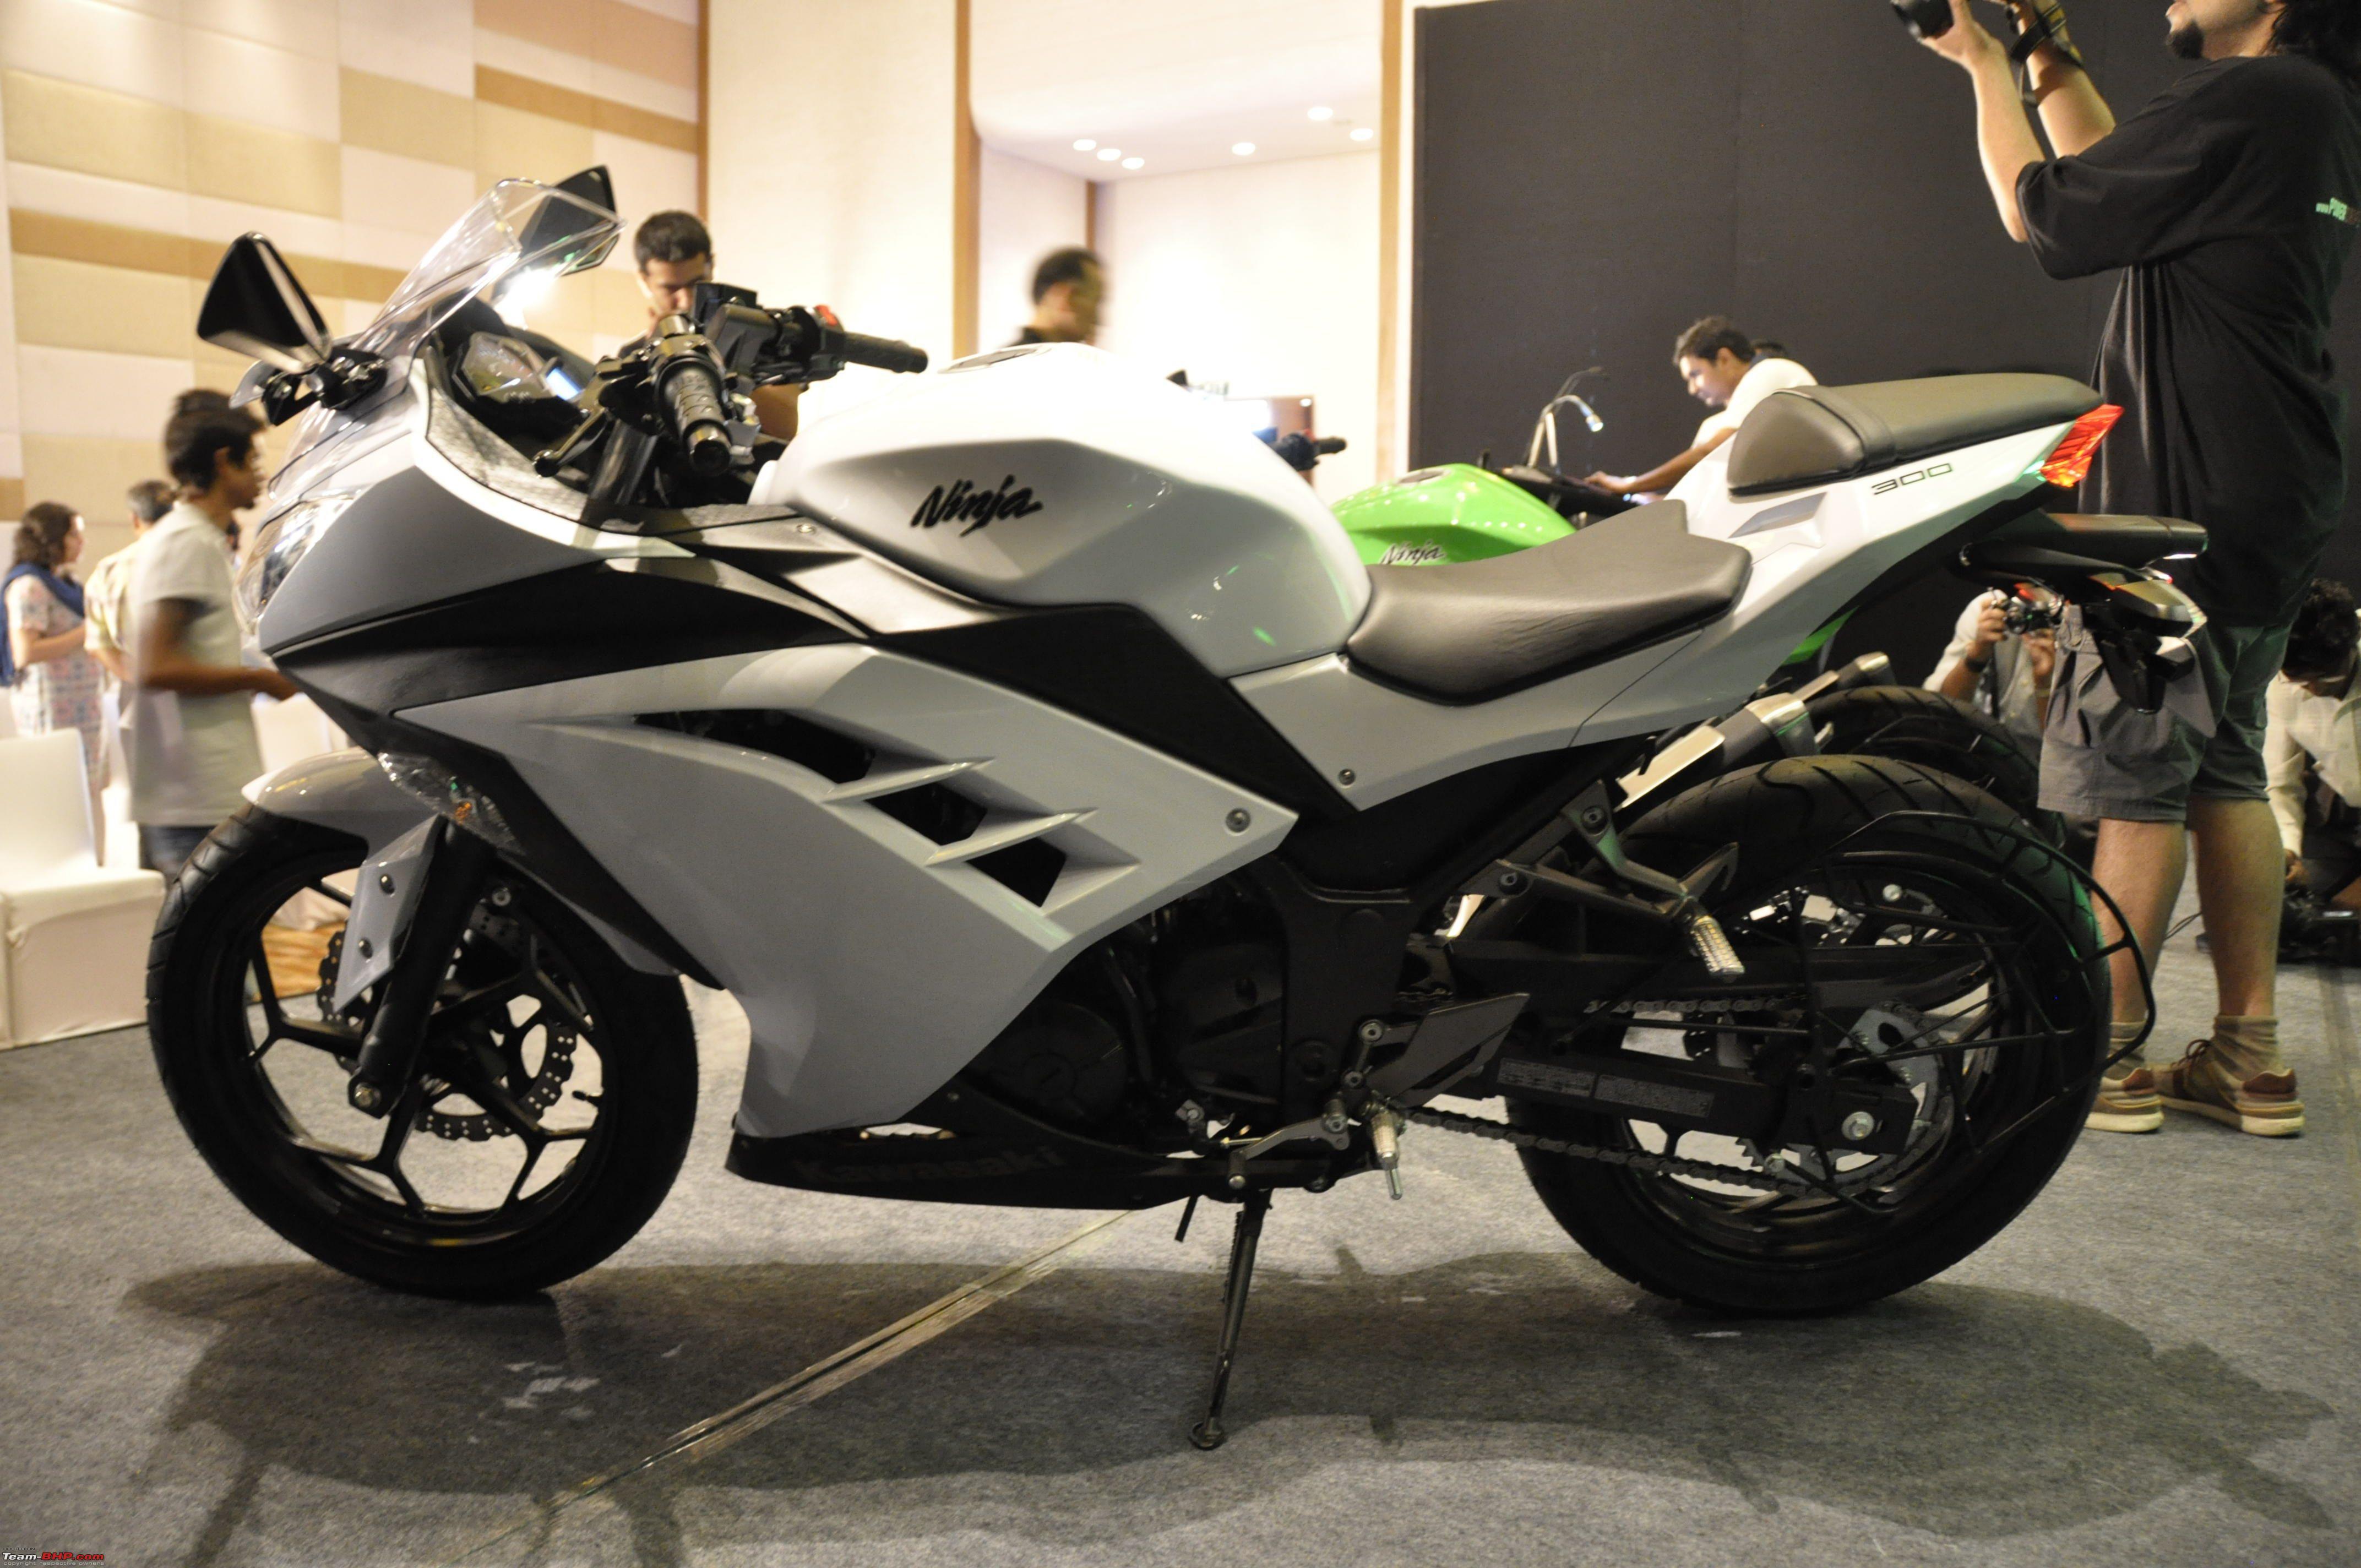 Bajaj Probiking Launches The Kawasaki Ninja 300 At Rs 350 Lakhs